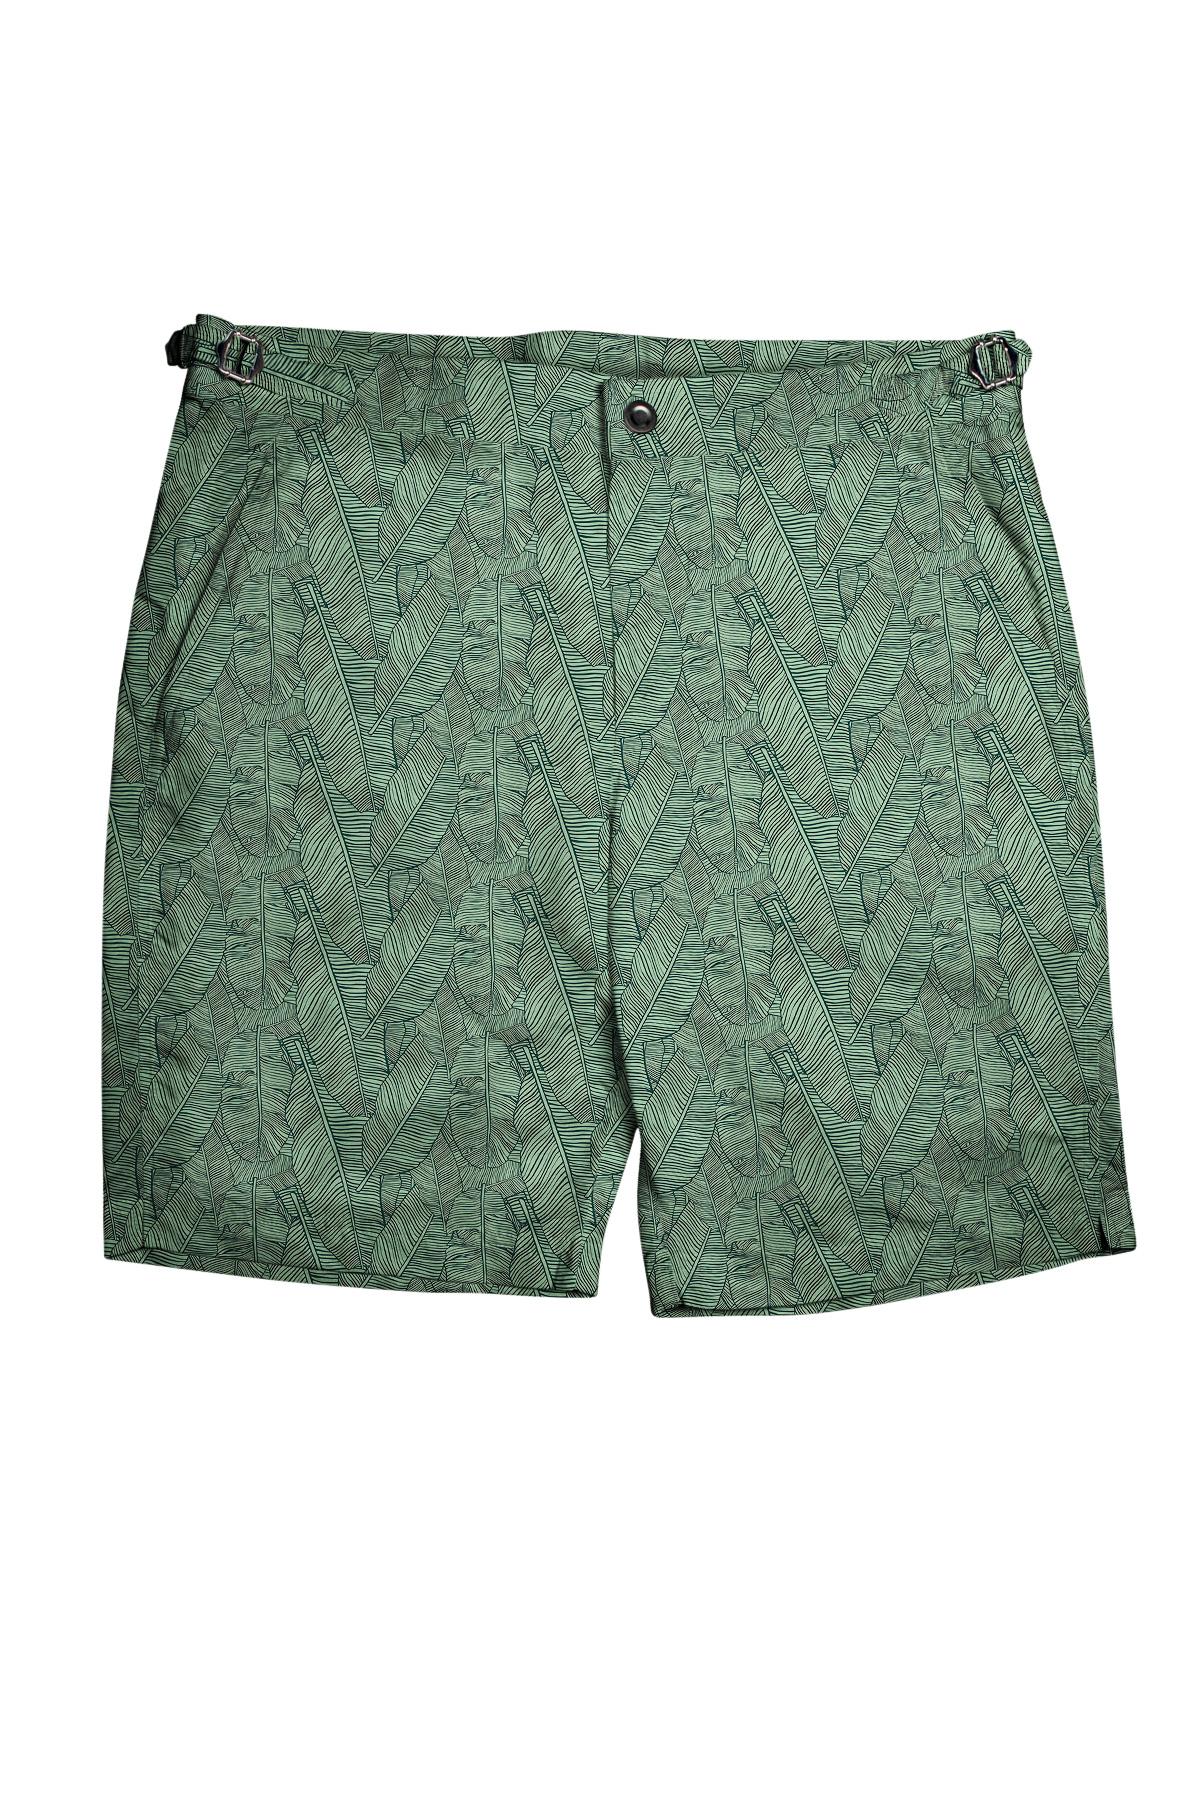 Green Palm Leaves Swim Shorts